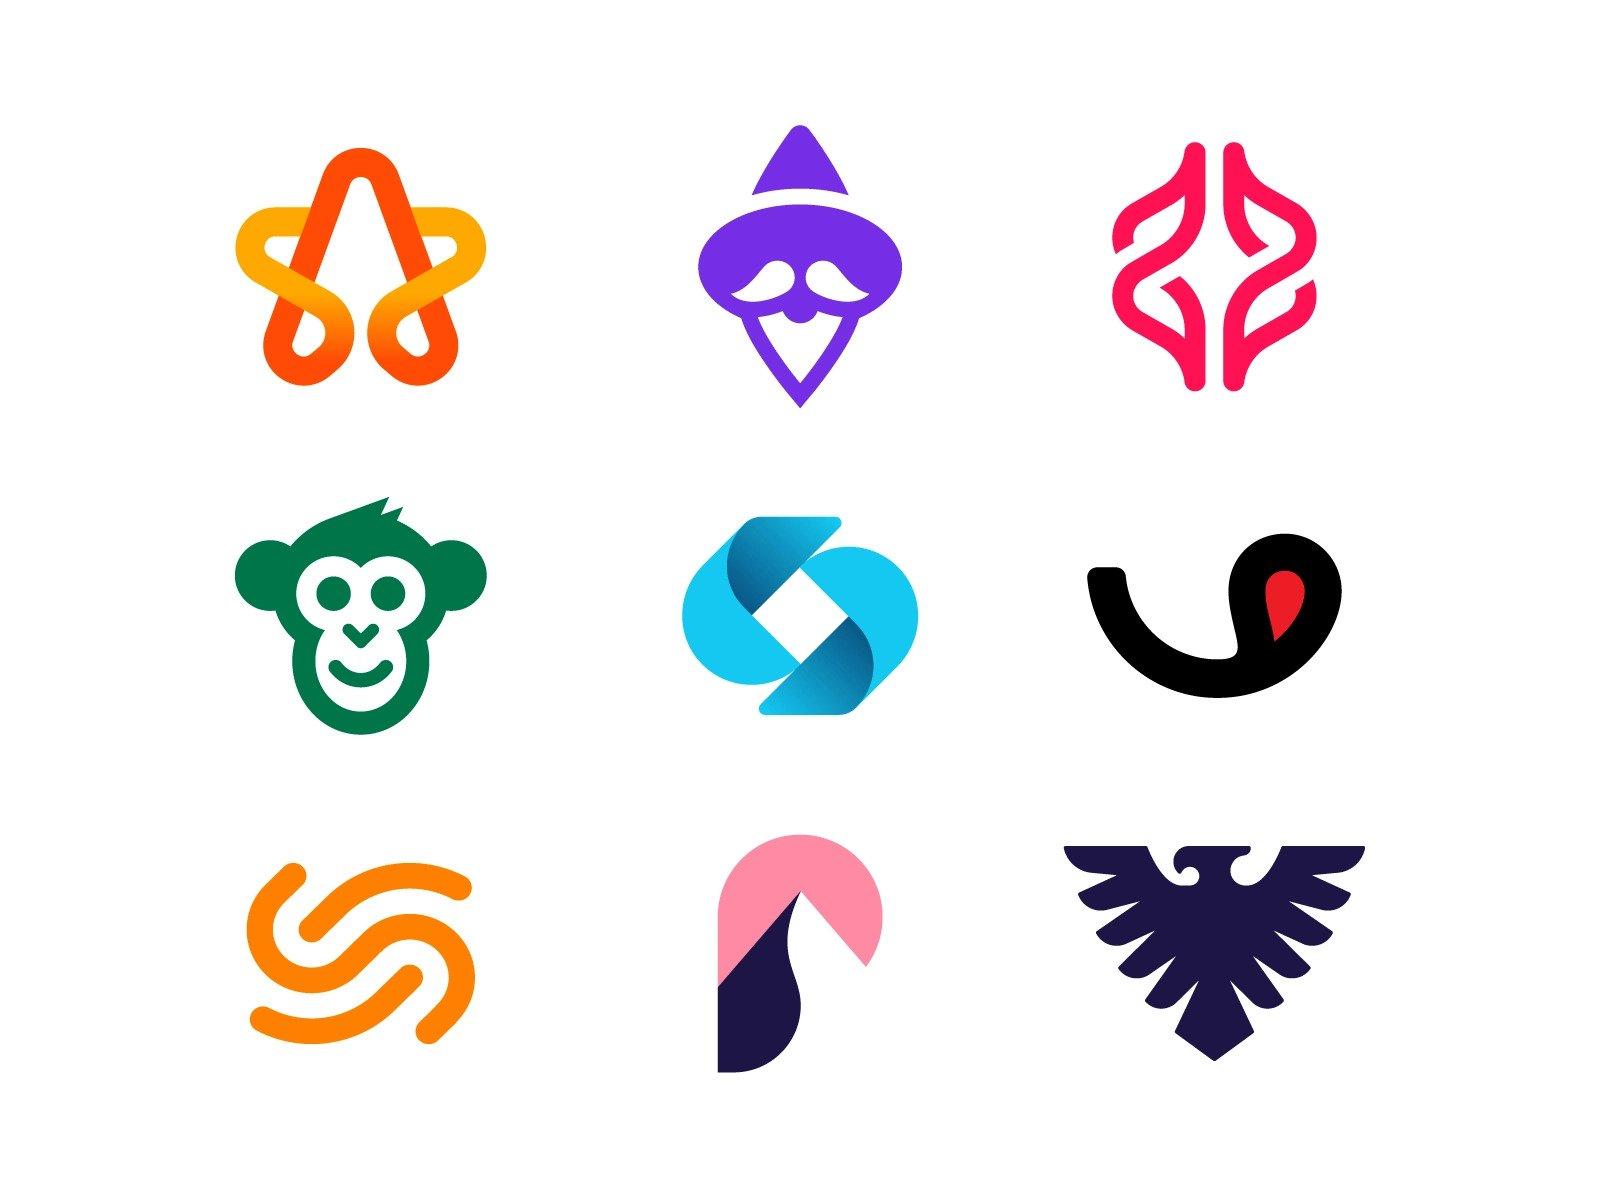 I will do creative minimalist logo design in 24 hours